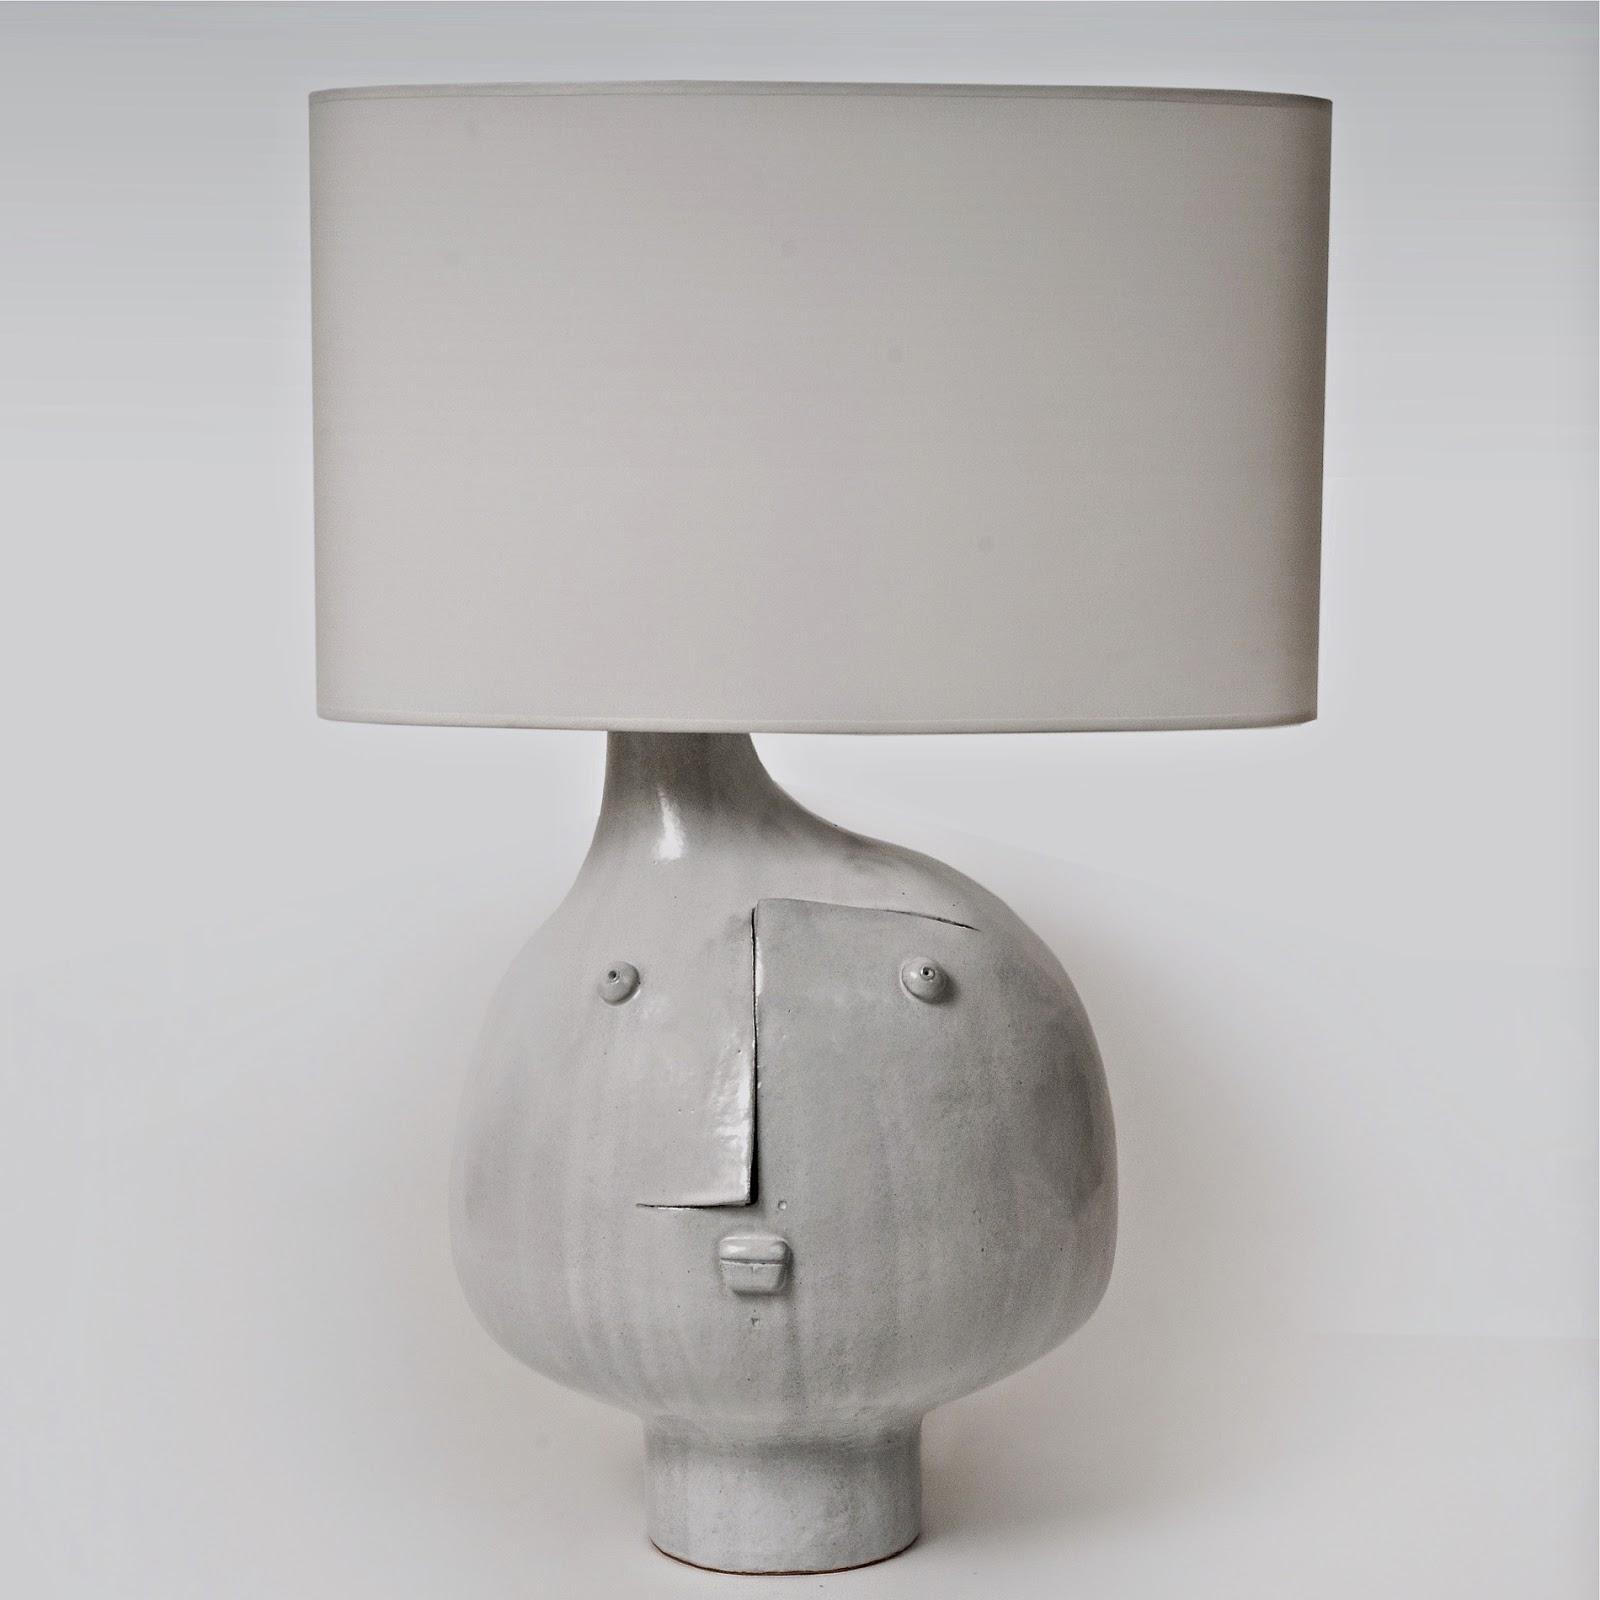 galerie riviera dalo grande lampe en c ramique. Black Bedroom Furniture Sets. Home Design Ideas